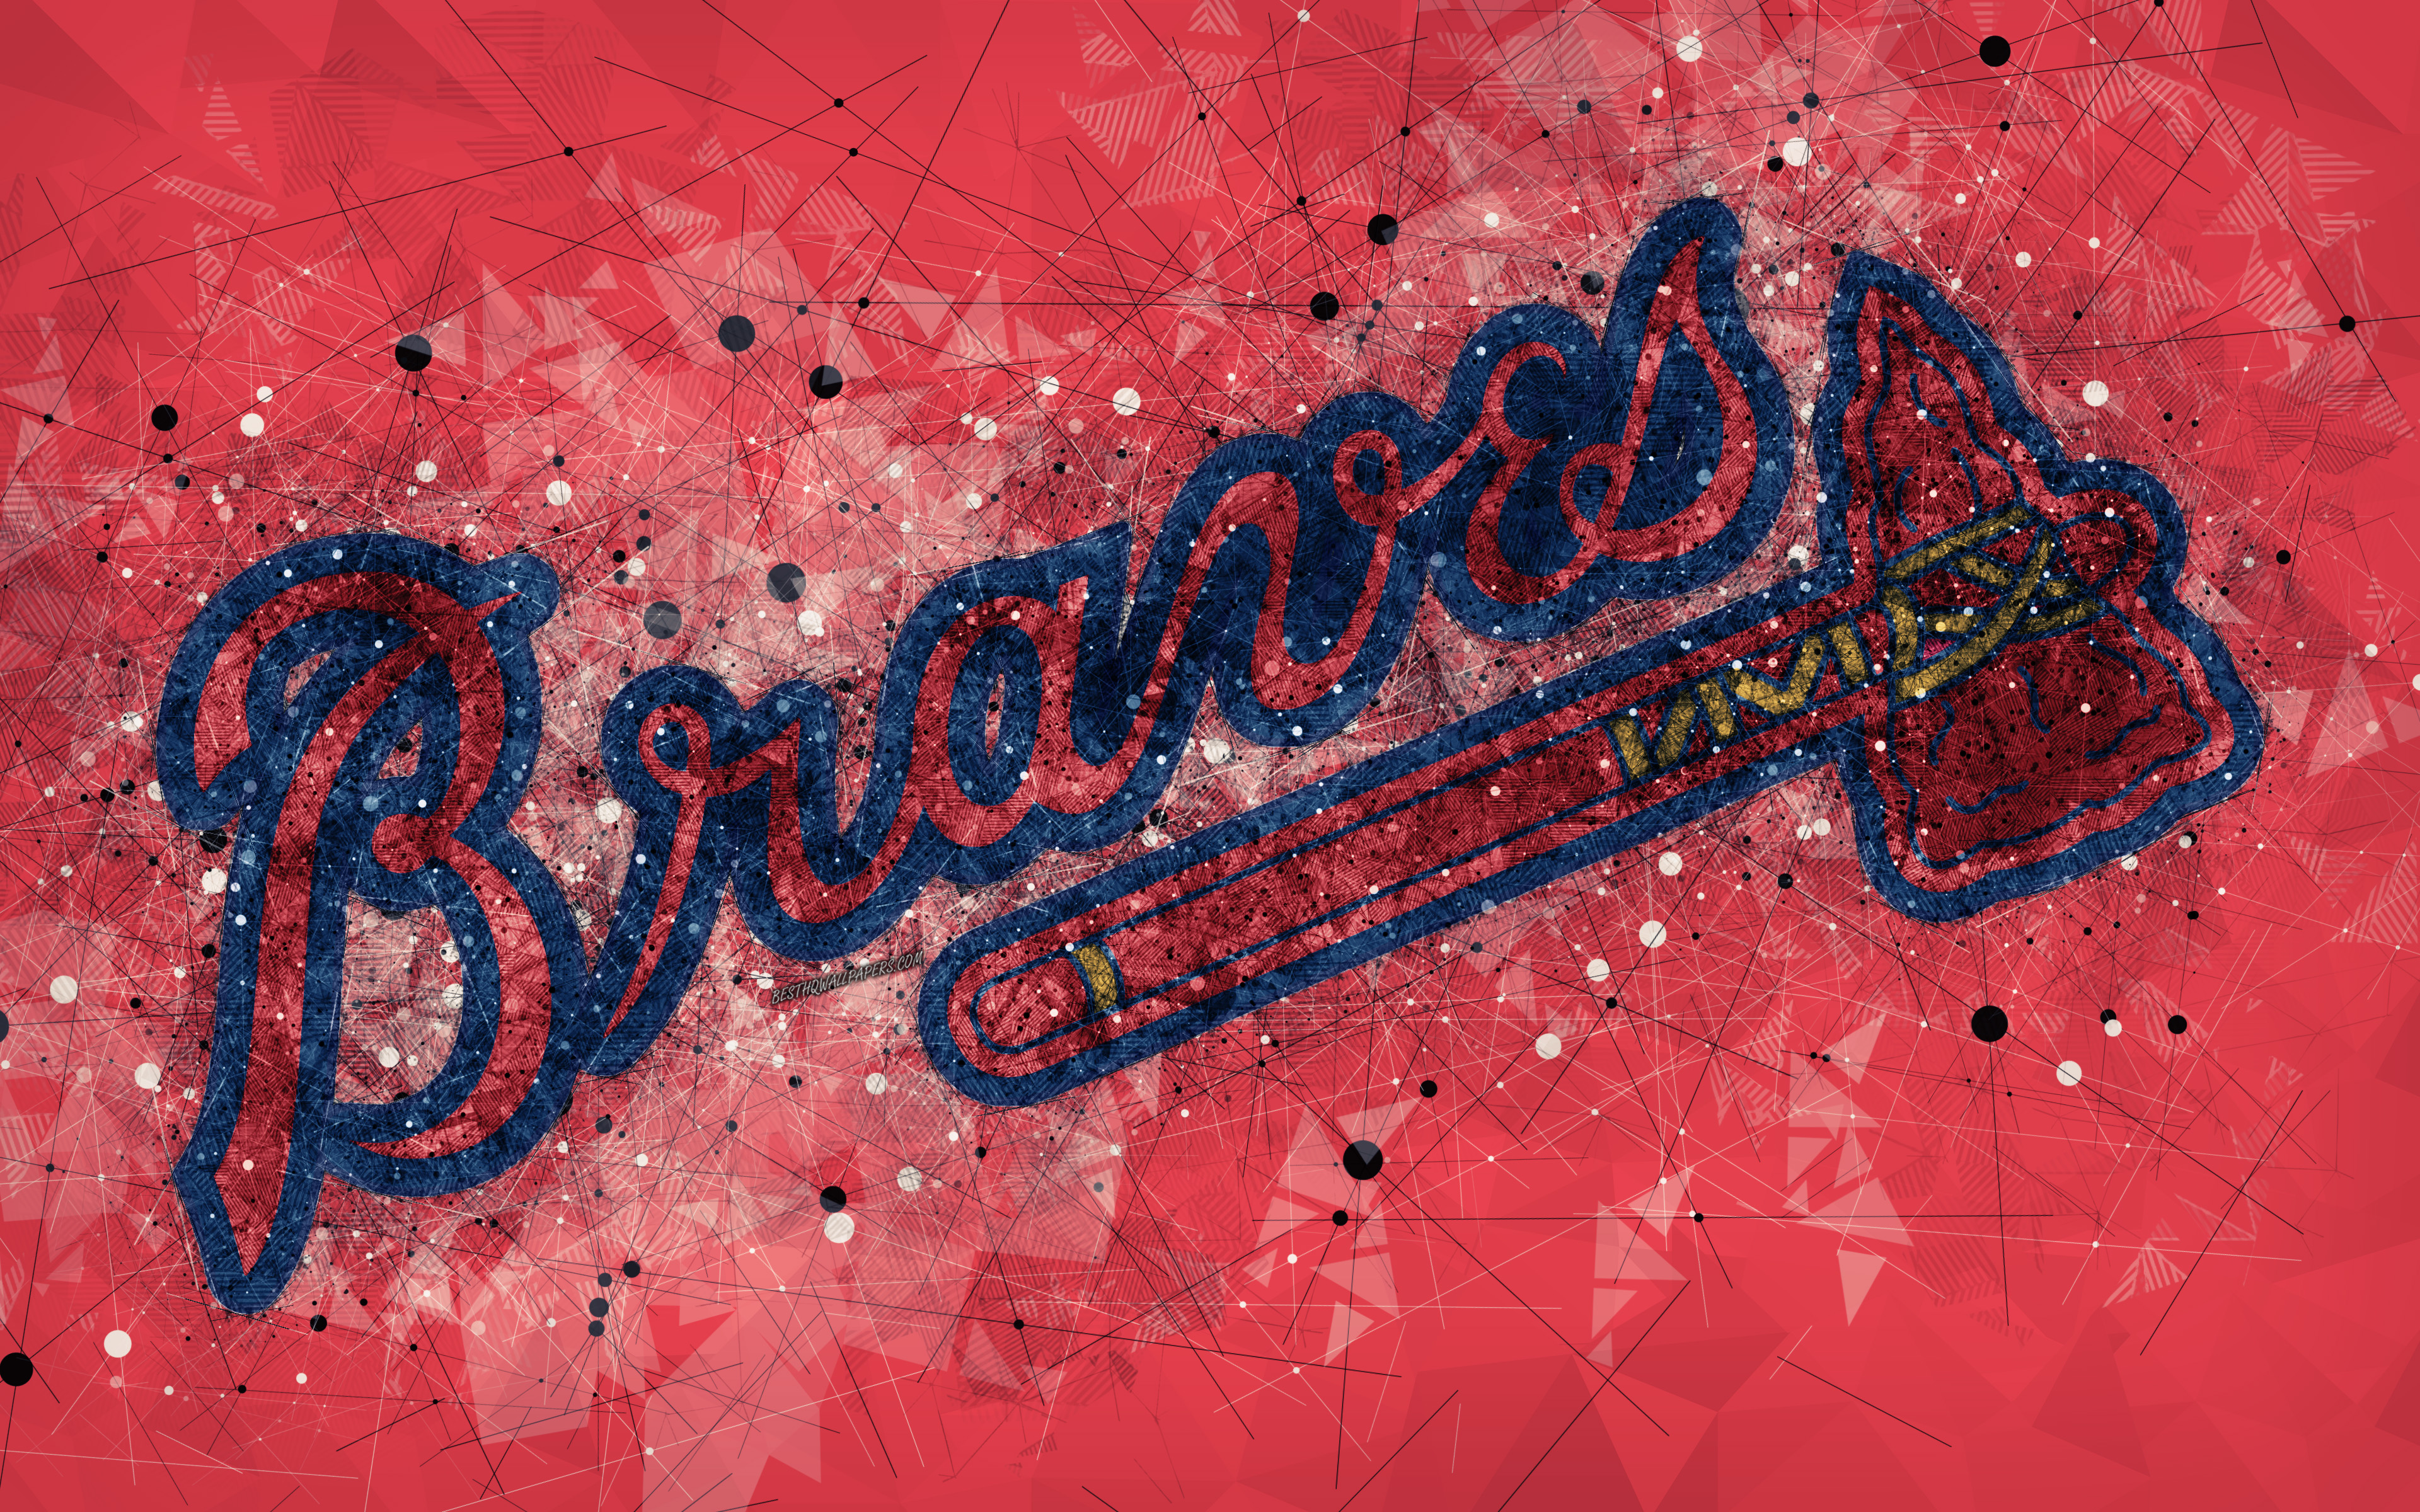 Atlanta Braves 4k American Baseball Club Geometric 3840x2400 Download Hd Wallpaper Wallpapertip